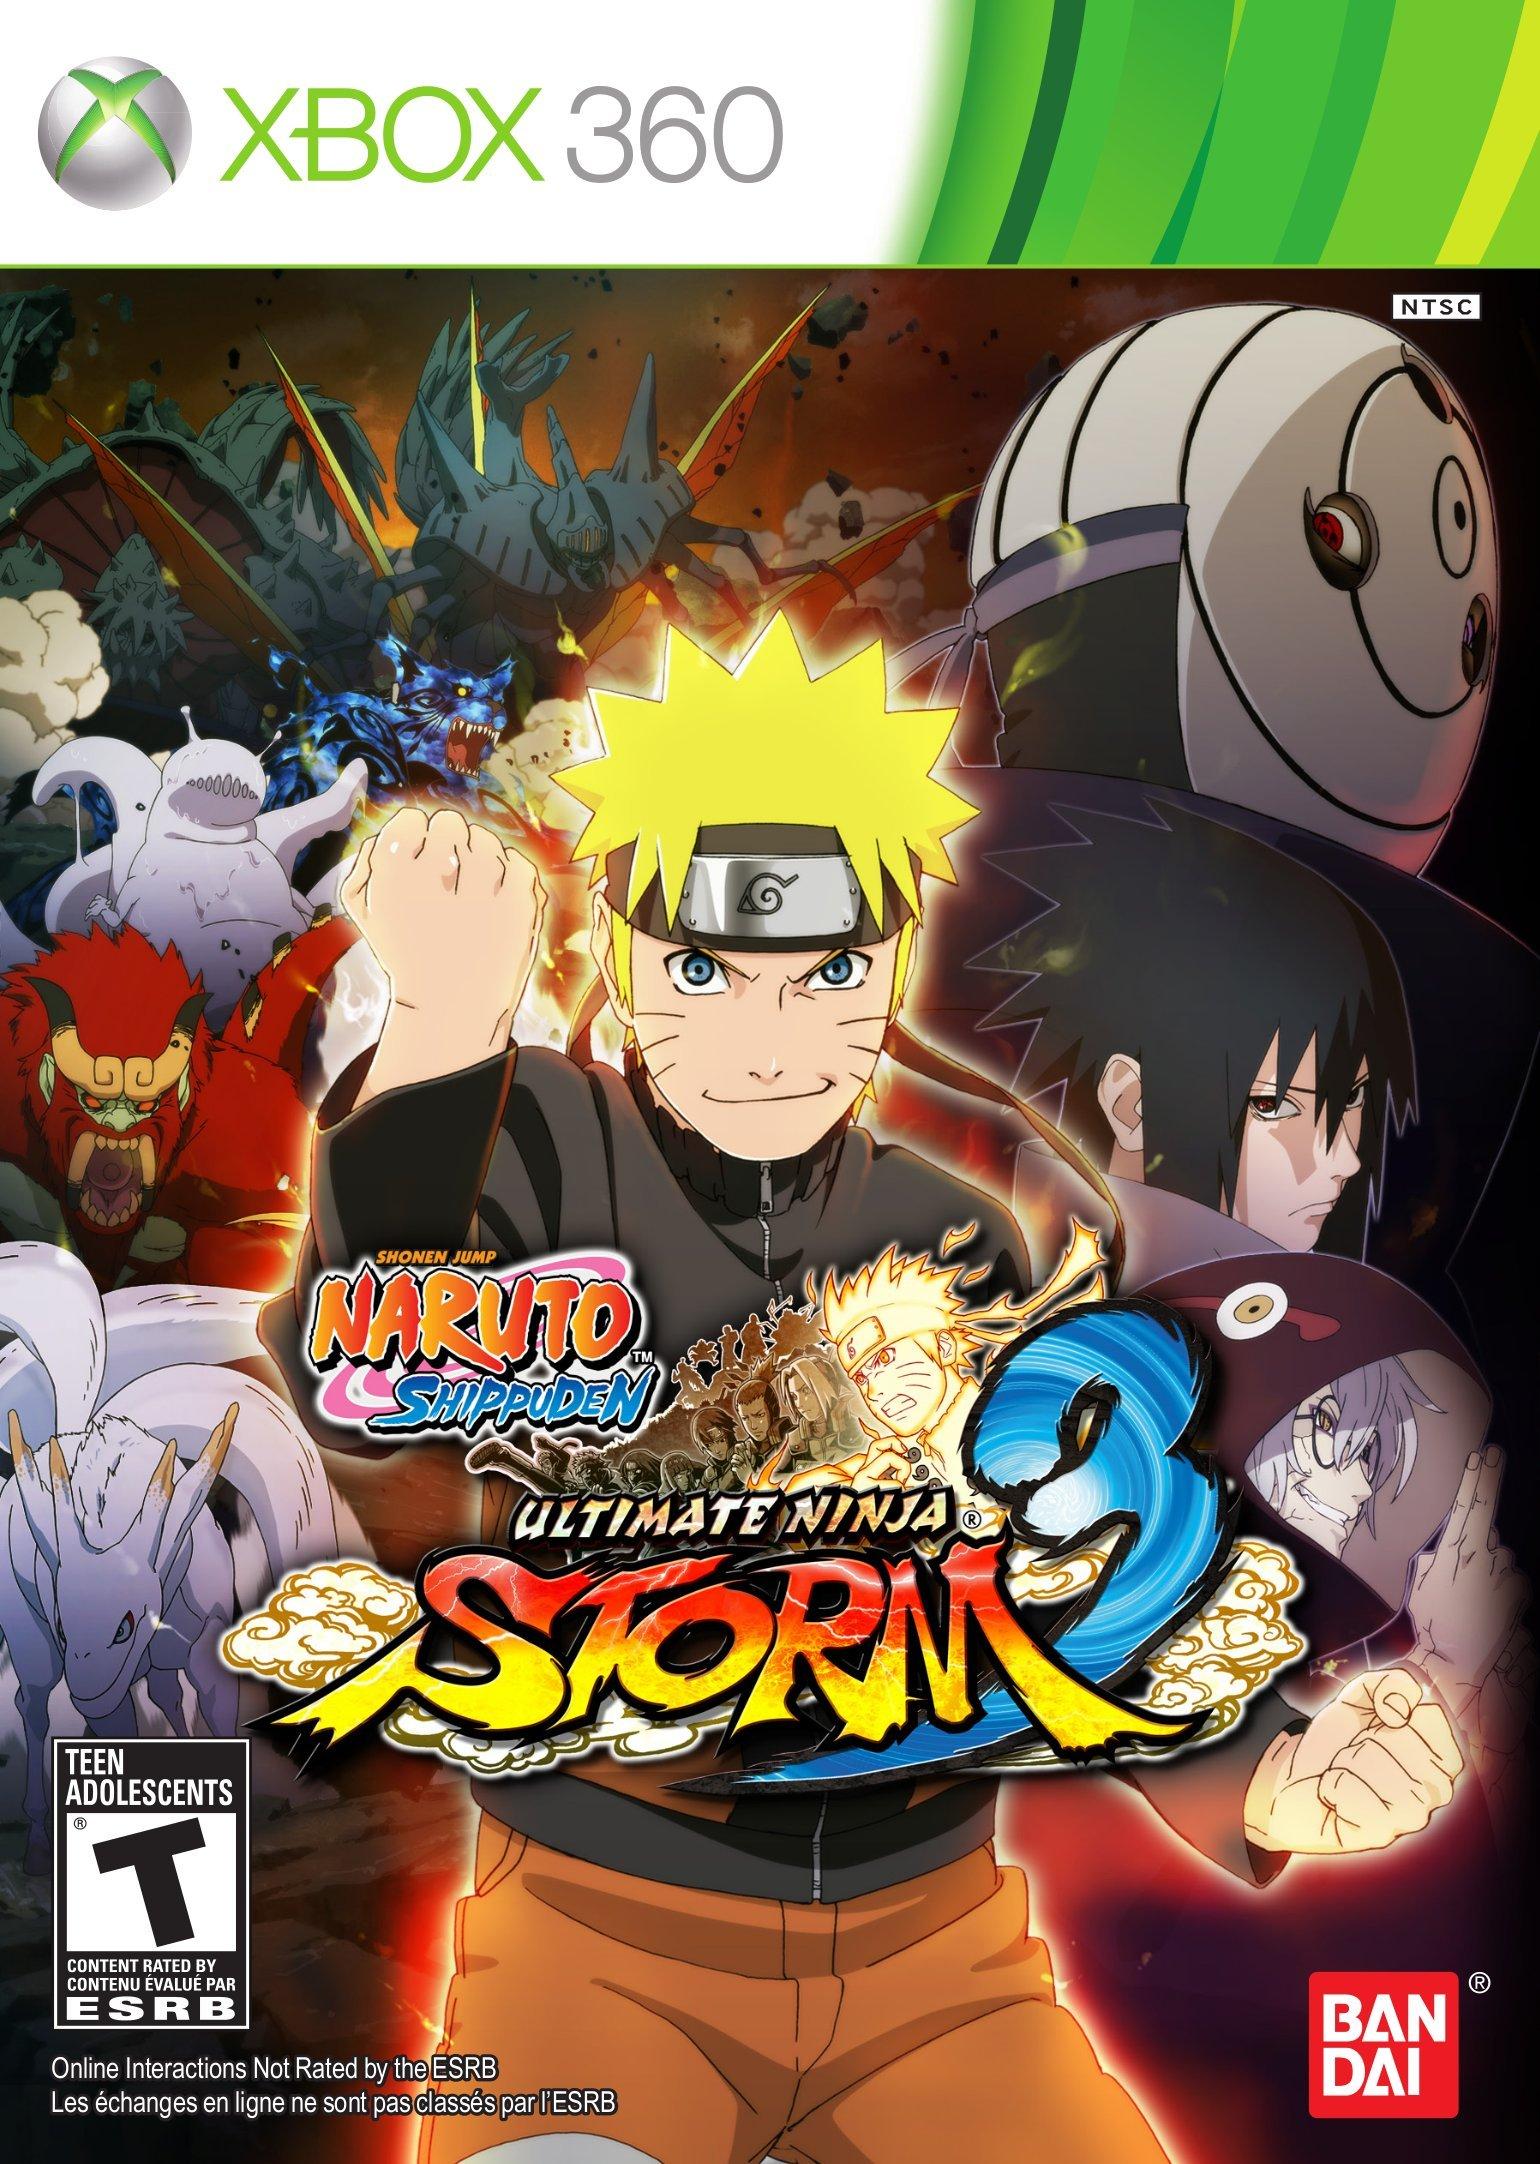 Amazon.com: Naruto Shippuden: Ultimate Ninja Storm 3 - Xbox ...